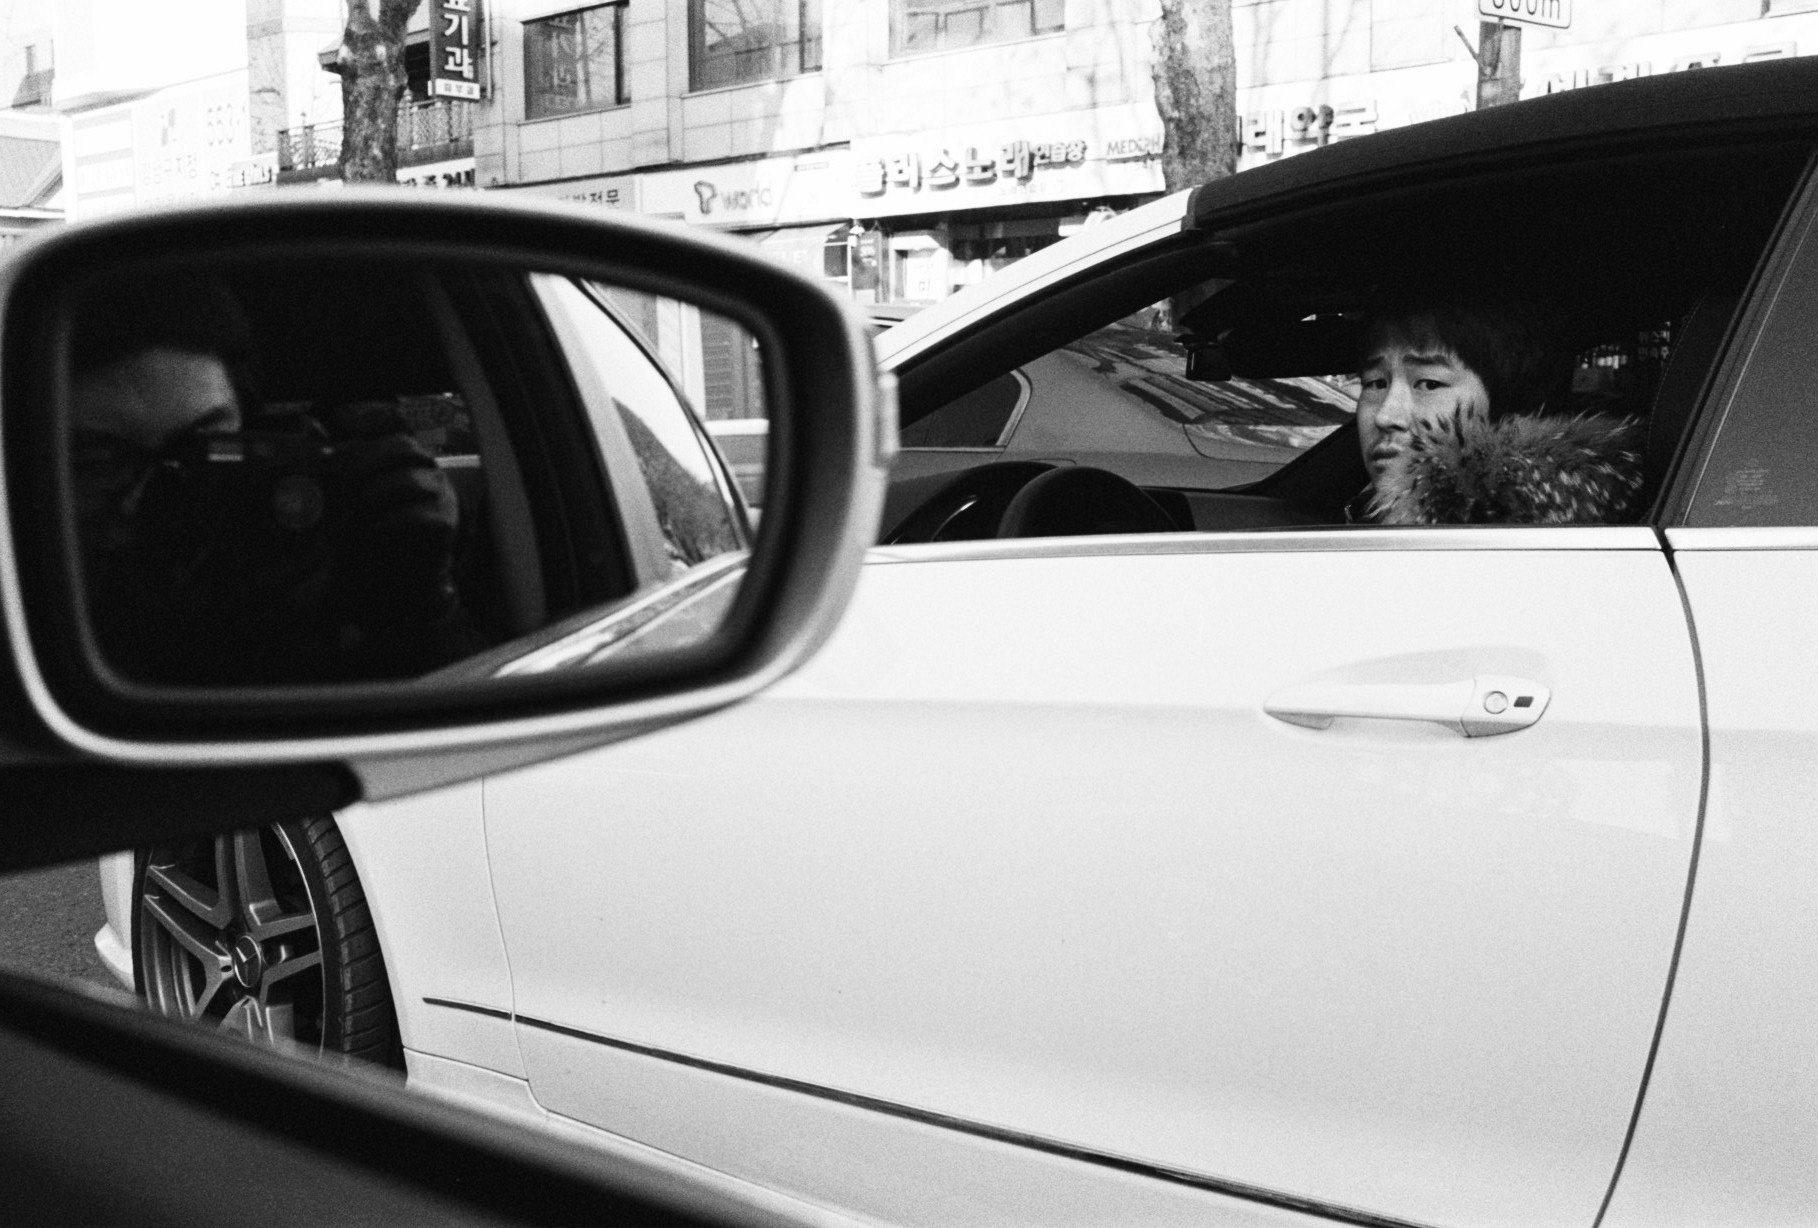 eric kim photography black and white - 6779806095_c2661e8ef4_o